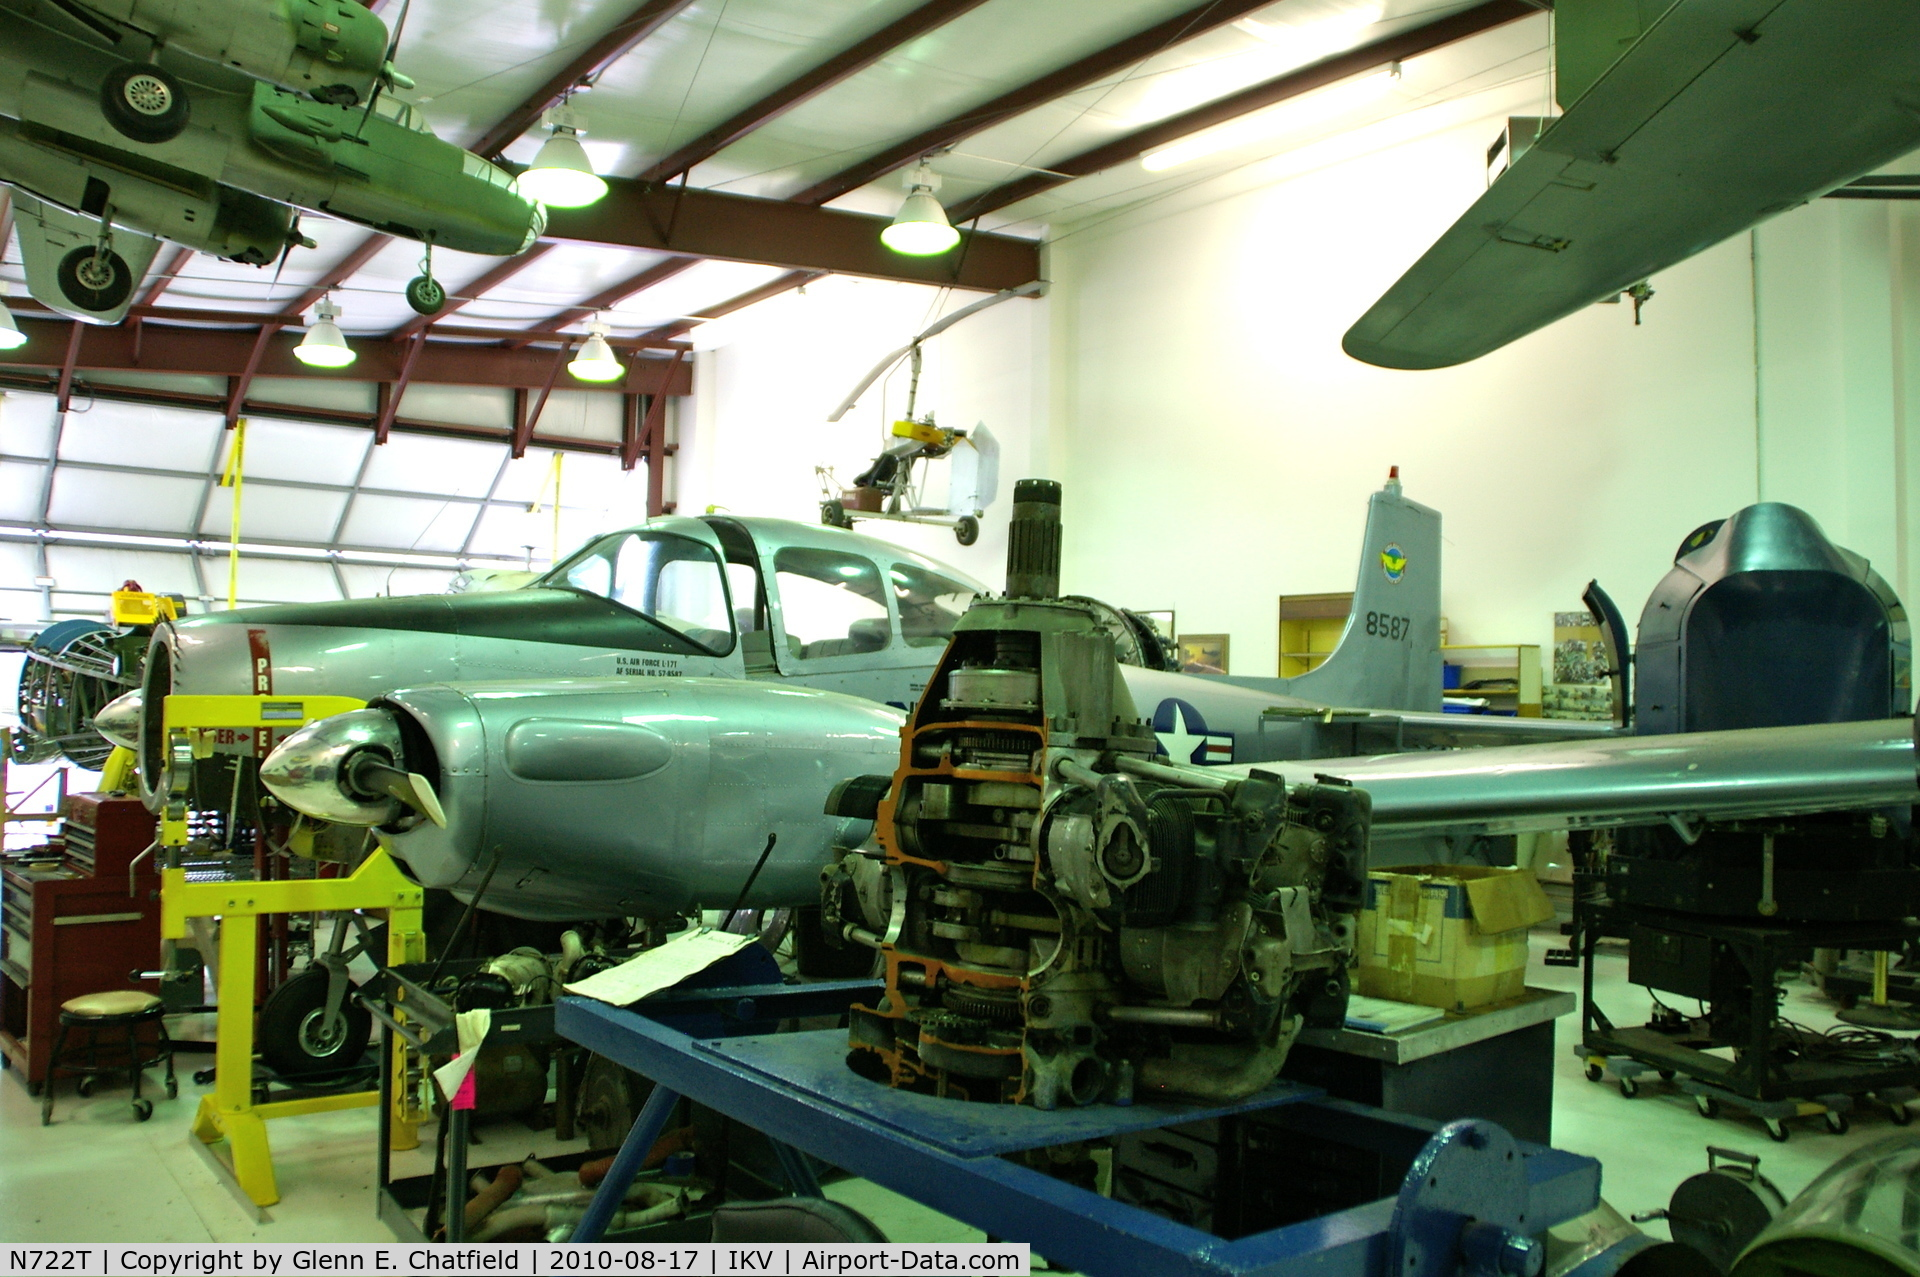 N722T, 1947 Temco D-16A Twin Navion C/N TTN-90 (NAV-4-482), Undergoing rebuild